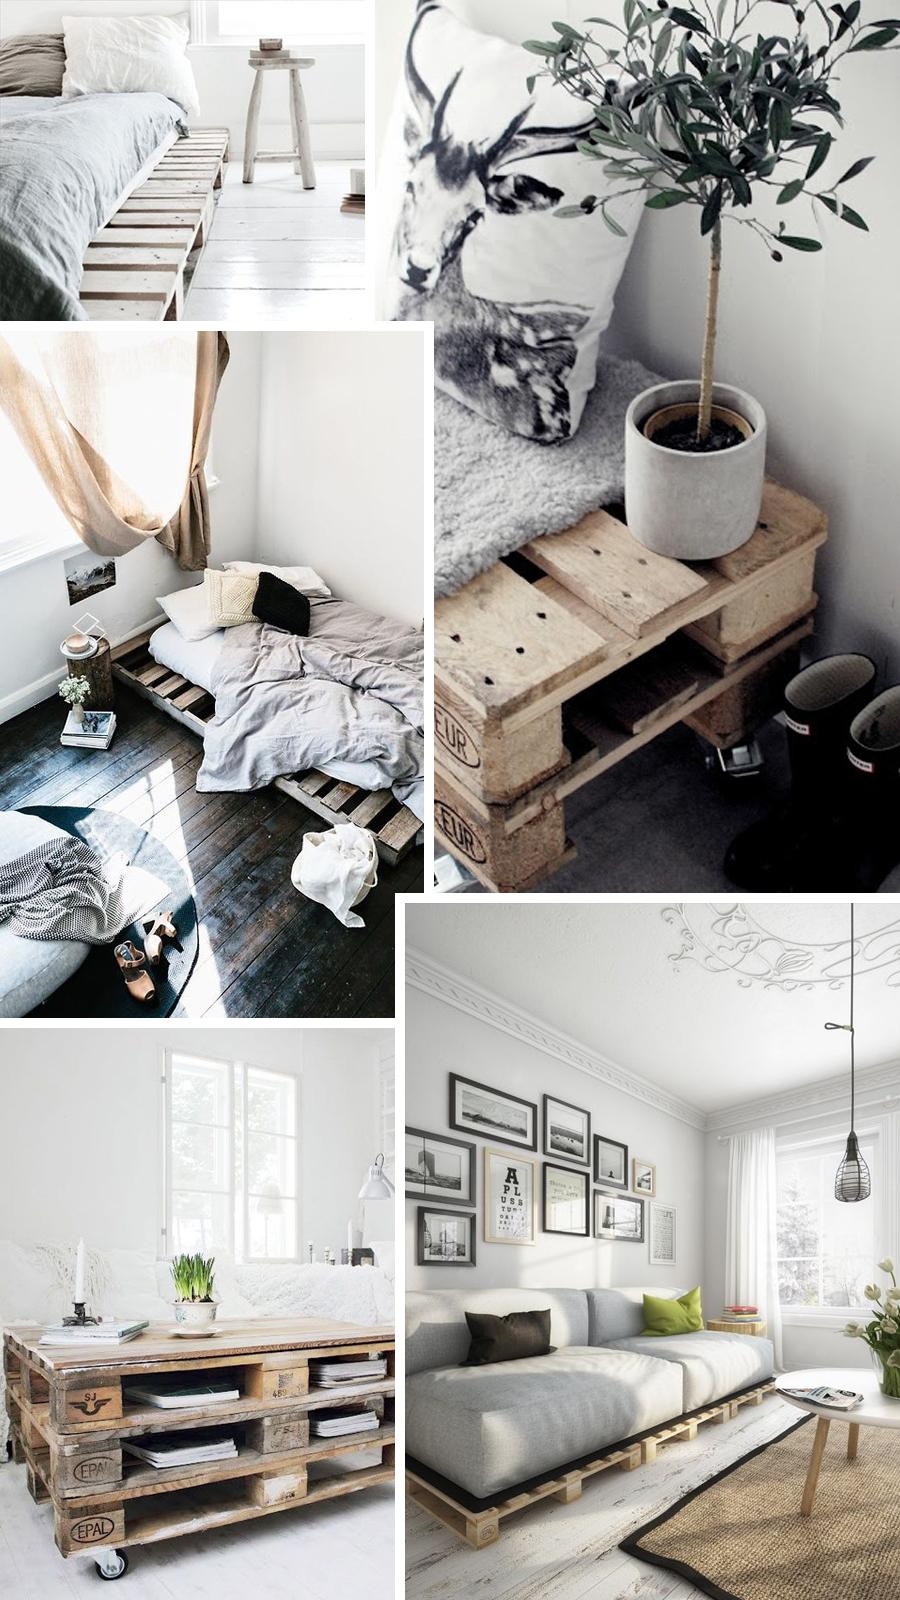 Interieur inspiratie pallets follow fashion for Kamer interieur inspiratie